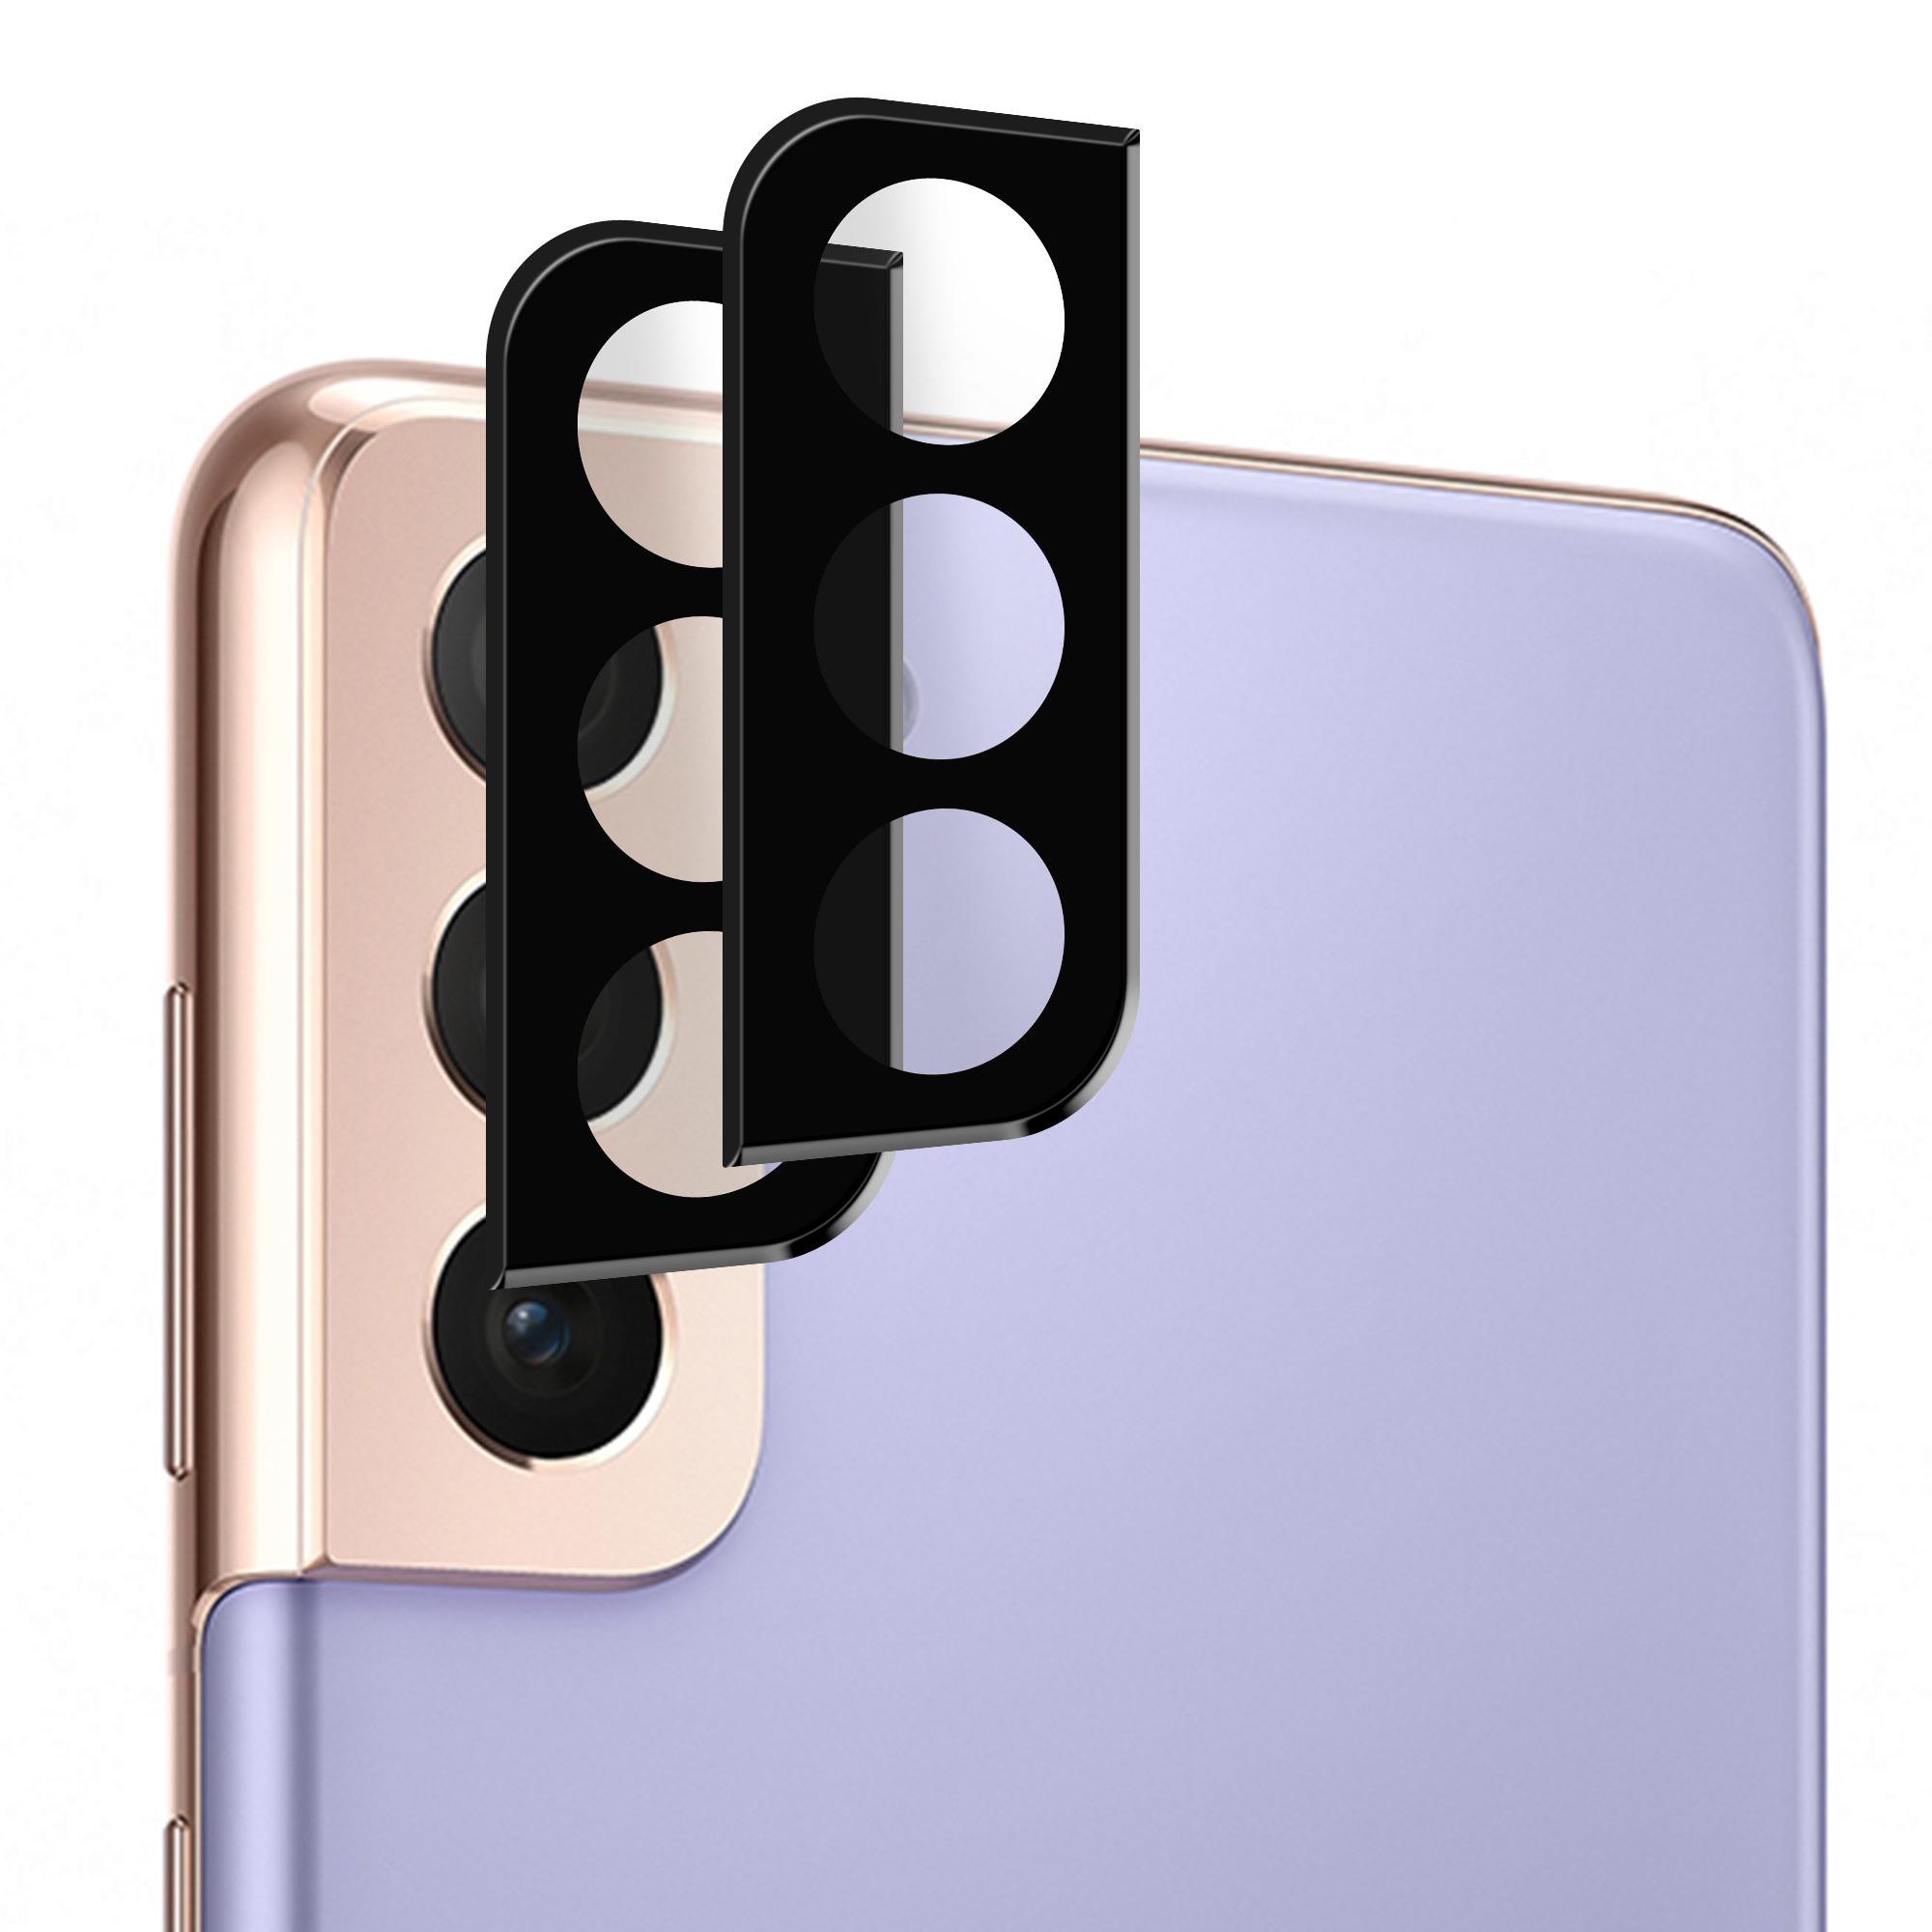 2x ochranné sklo na zadní kameru pro Samsung Galaxy S21 Plus